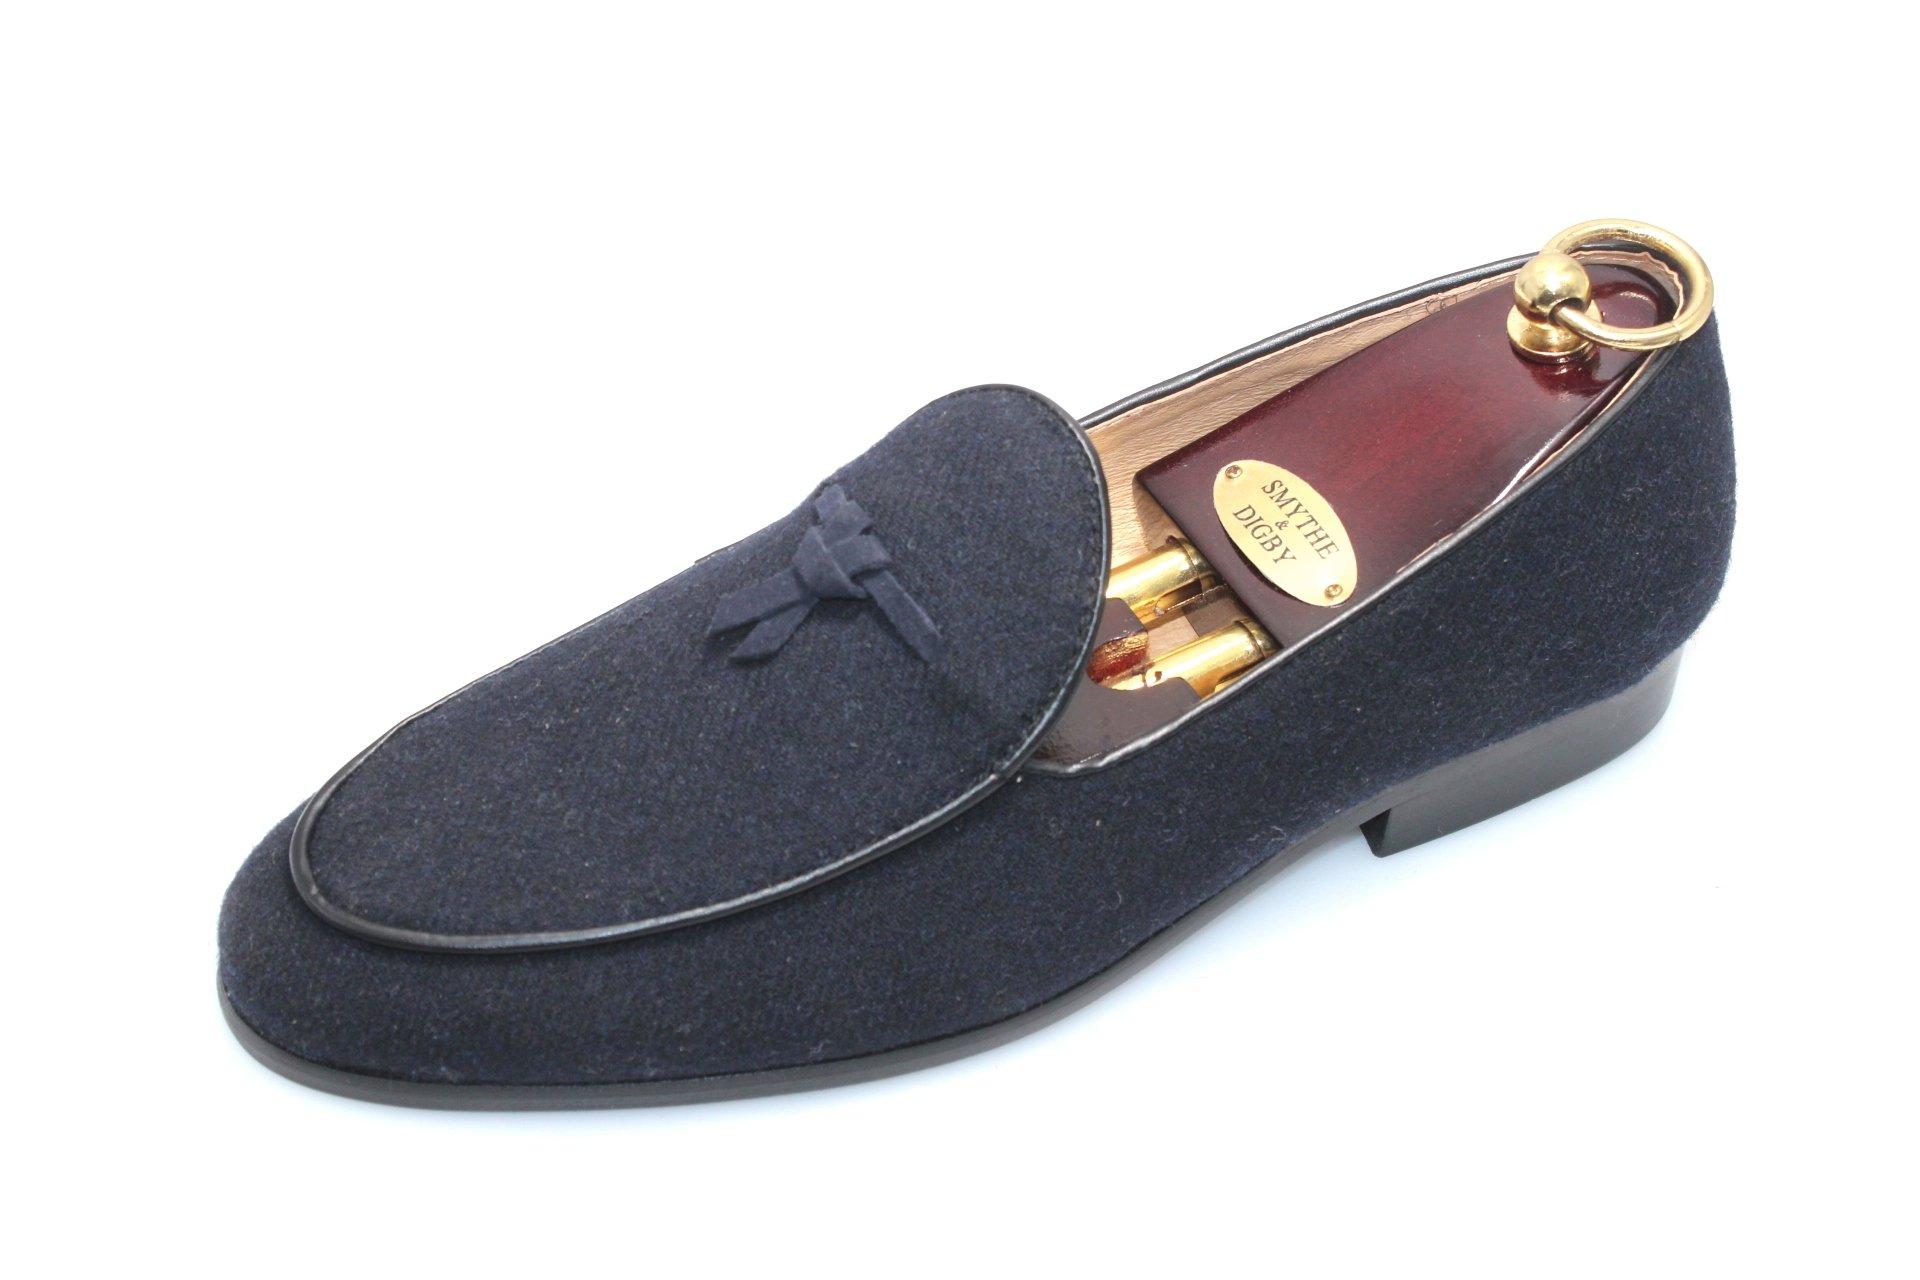 SMYTHE & DIGBY Men's Navy Blue Flannel Albert Slippers Leather Velvet Loafers (9.5)